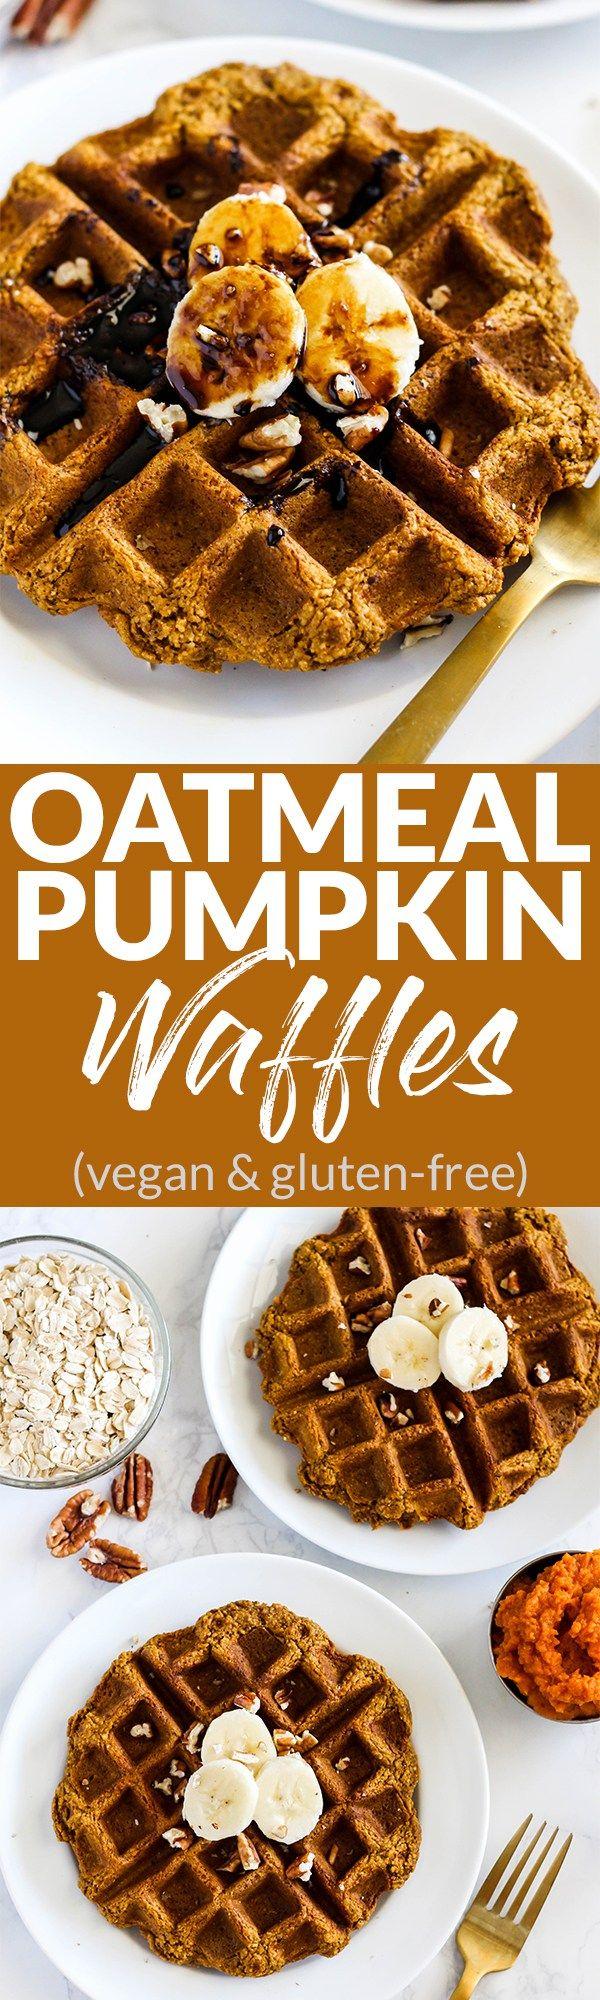 Vegan Oatmeal Pumpkin Waffles (glutenfree) Recipe